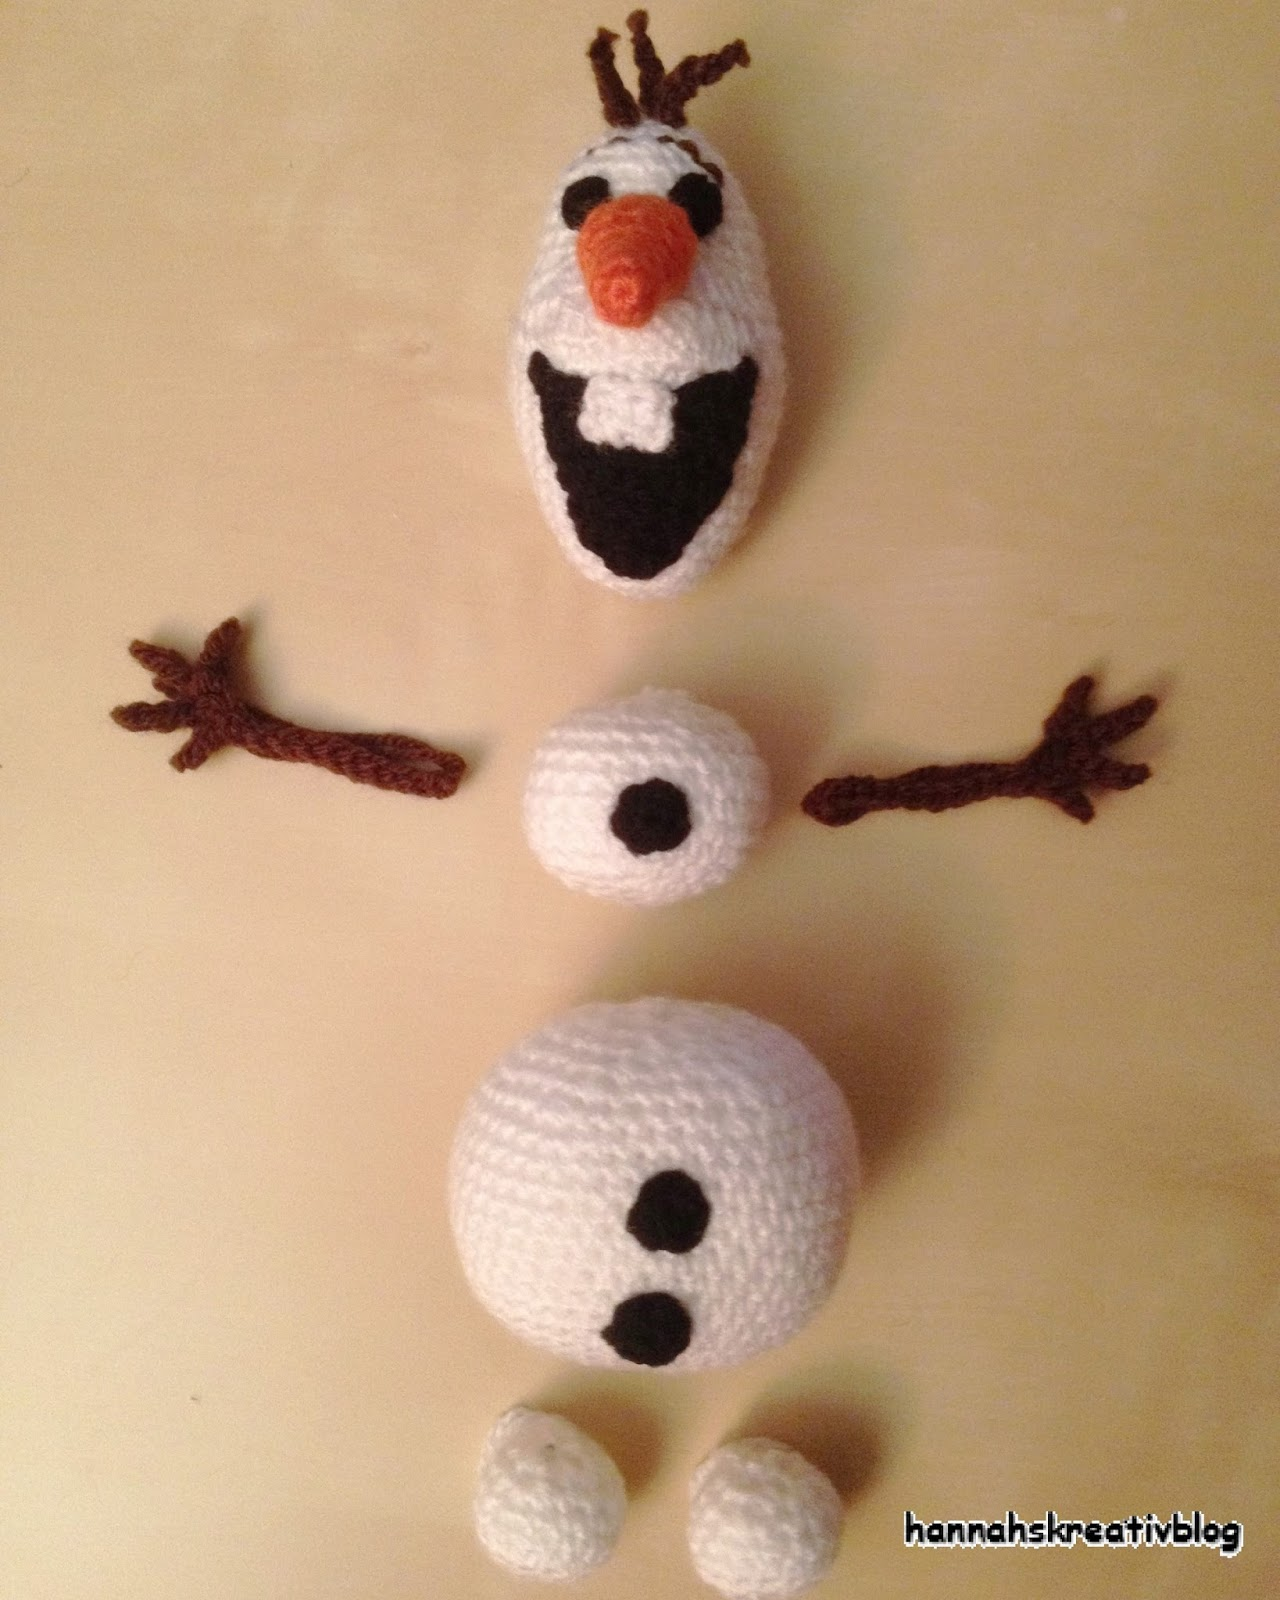 crochet OLAF pattern - Frozen | Häkeln olaf, Frozen häkeln, Häkeln ... | 1600x1280